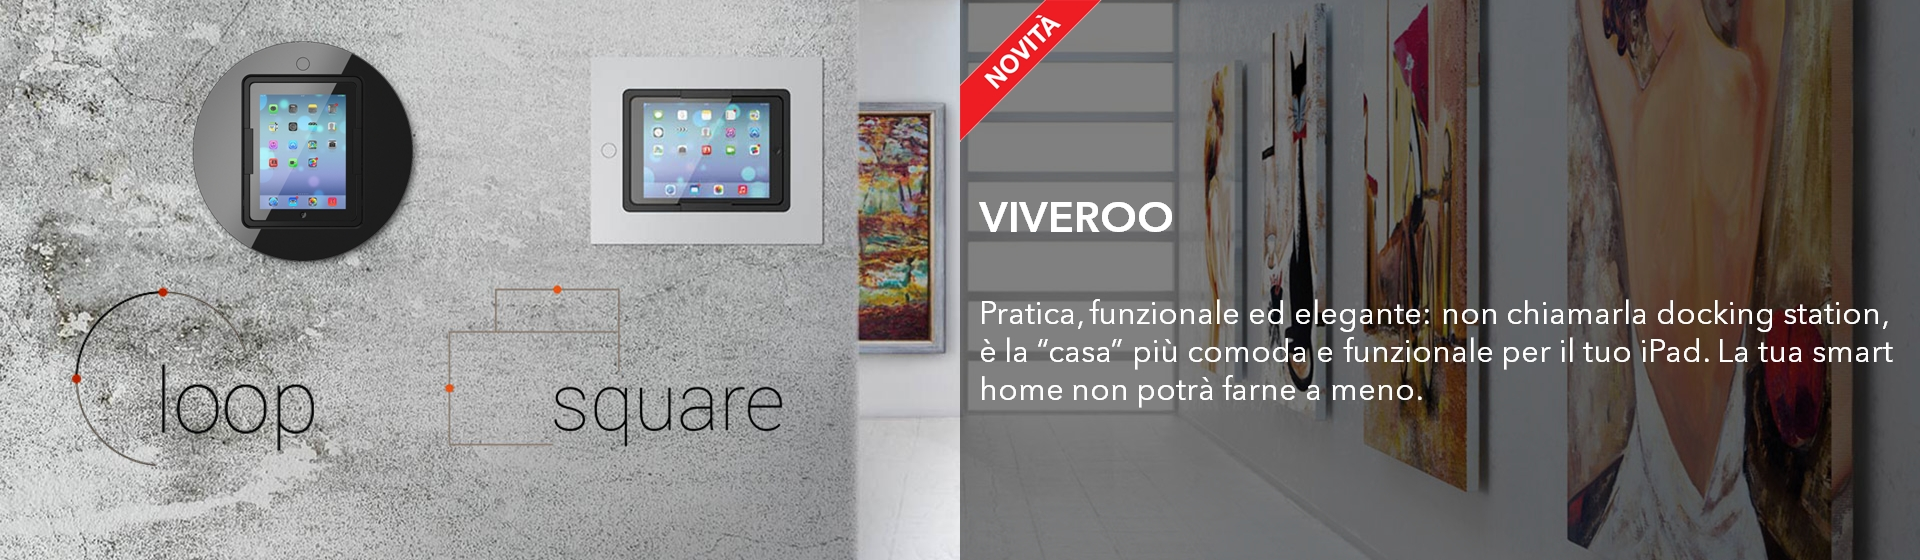 slide_viveroo